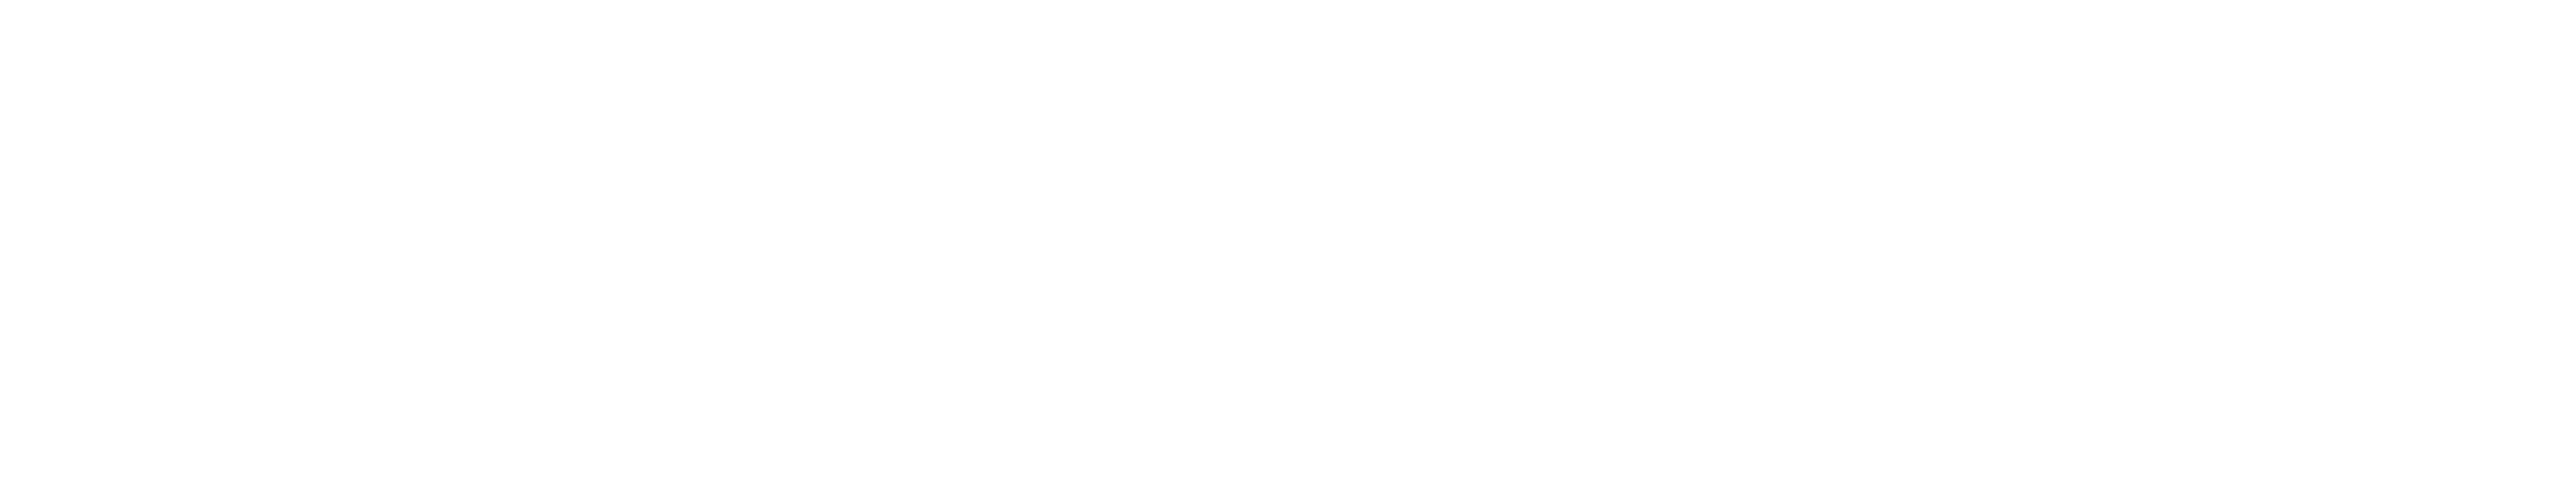 Andromeda.id